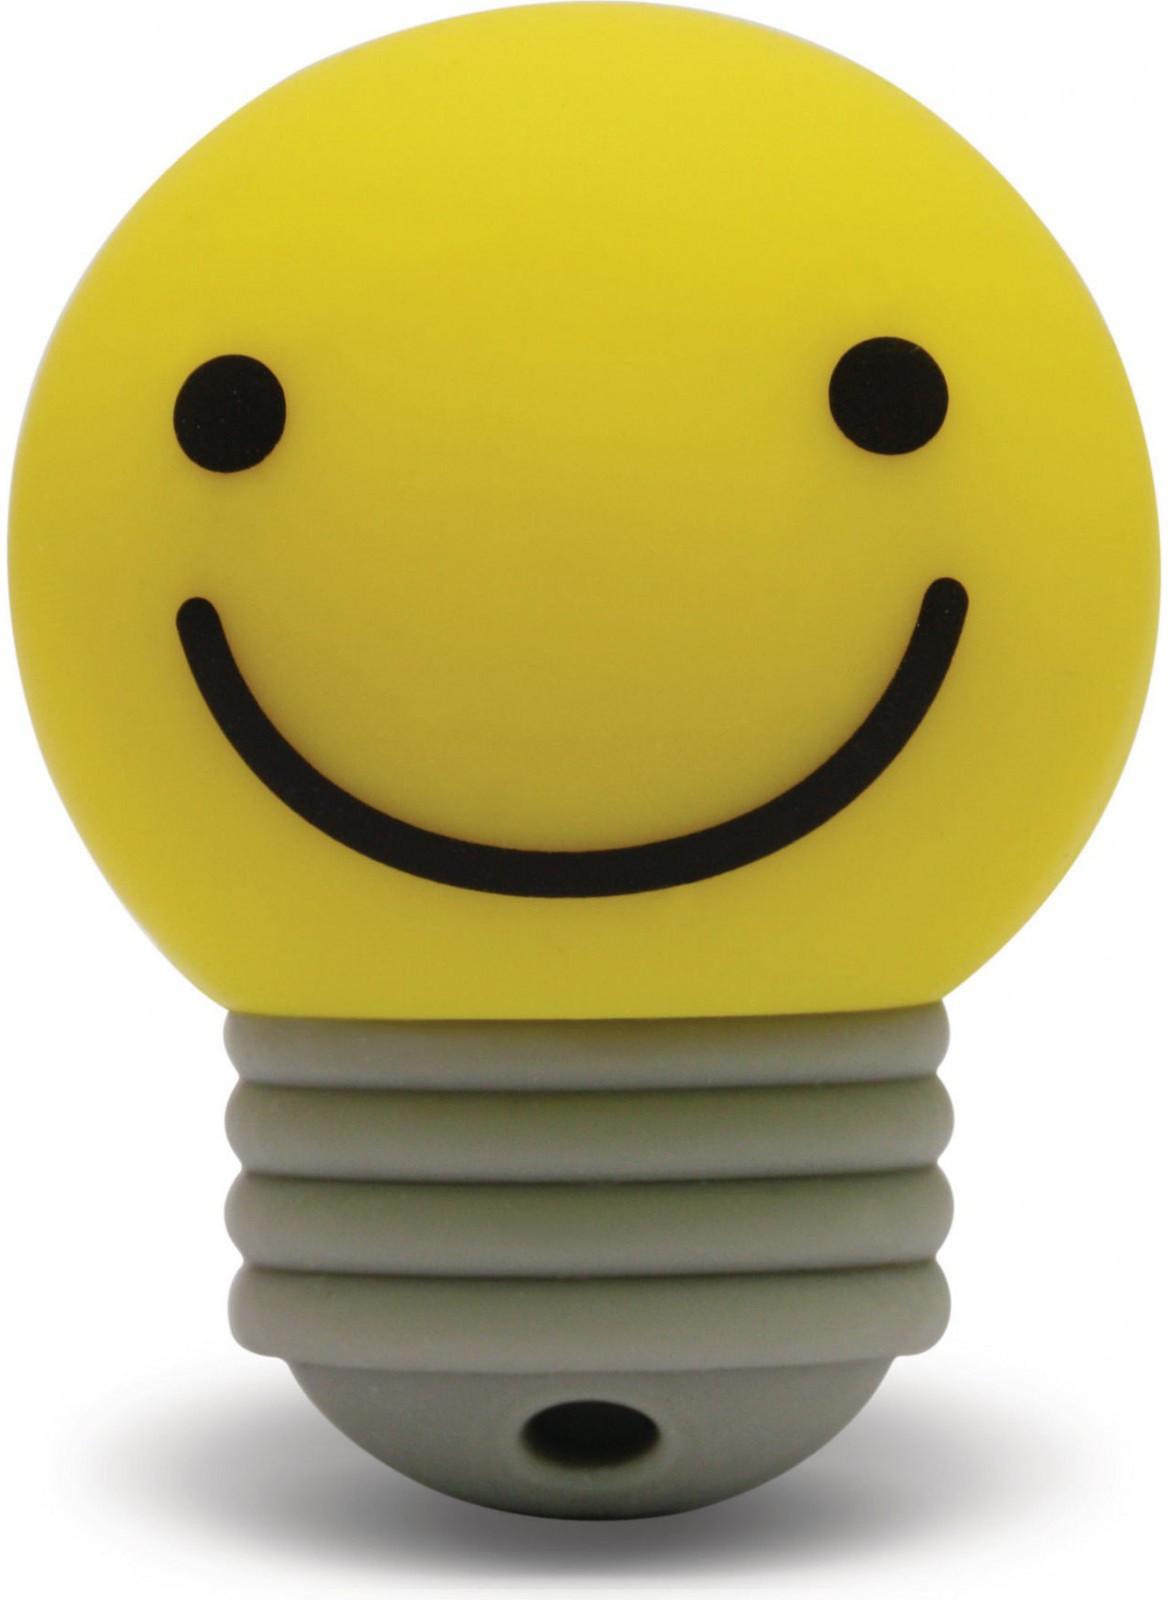 USB Flash Philips Power 4Gb Yellow - Фото 1